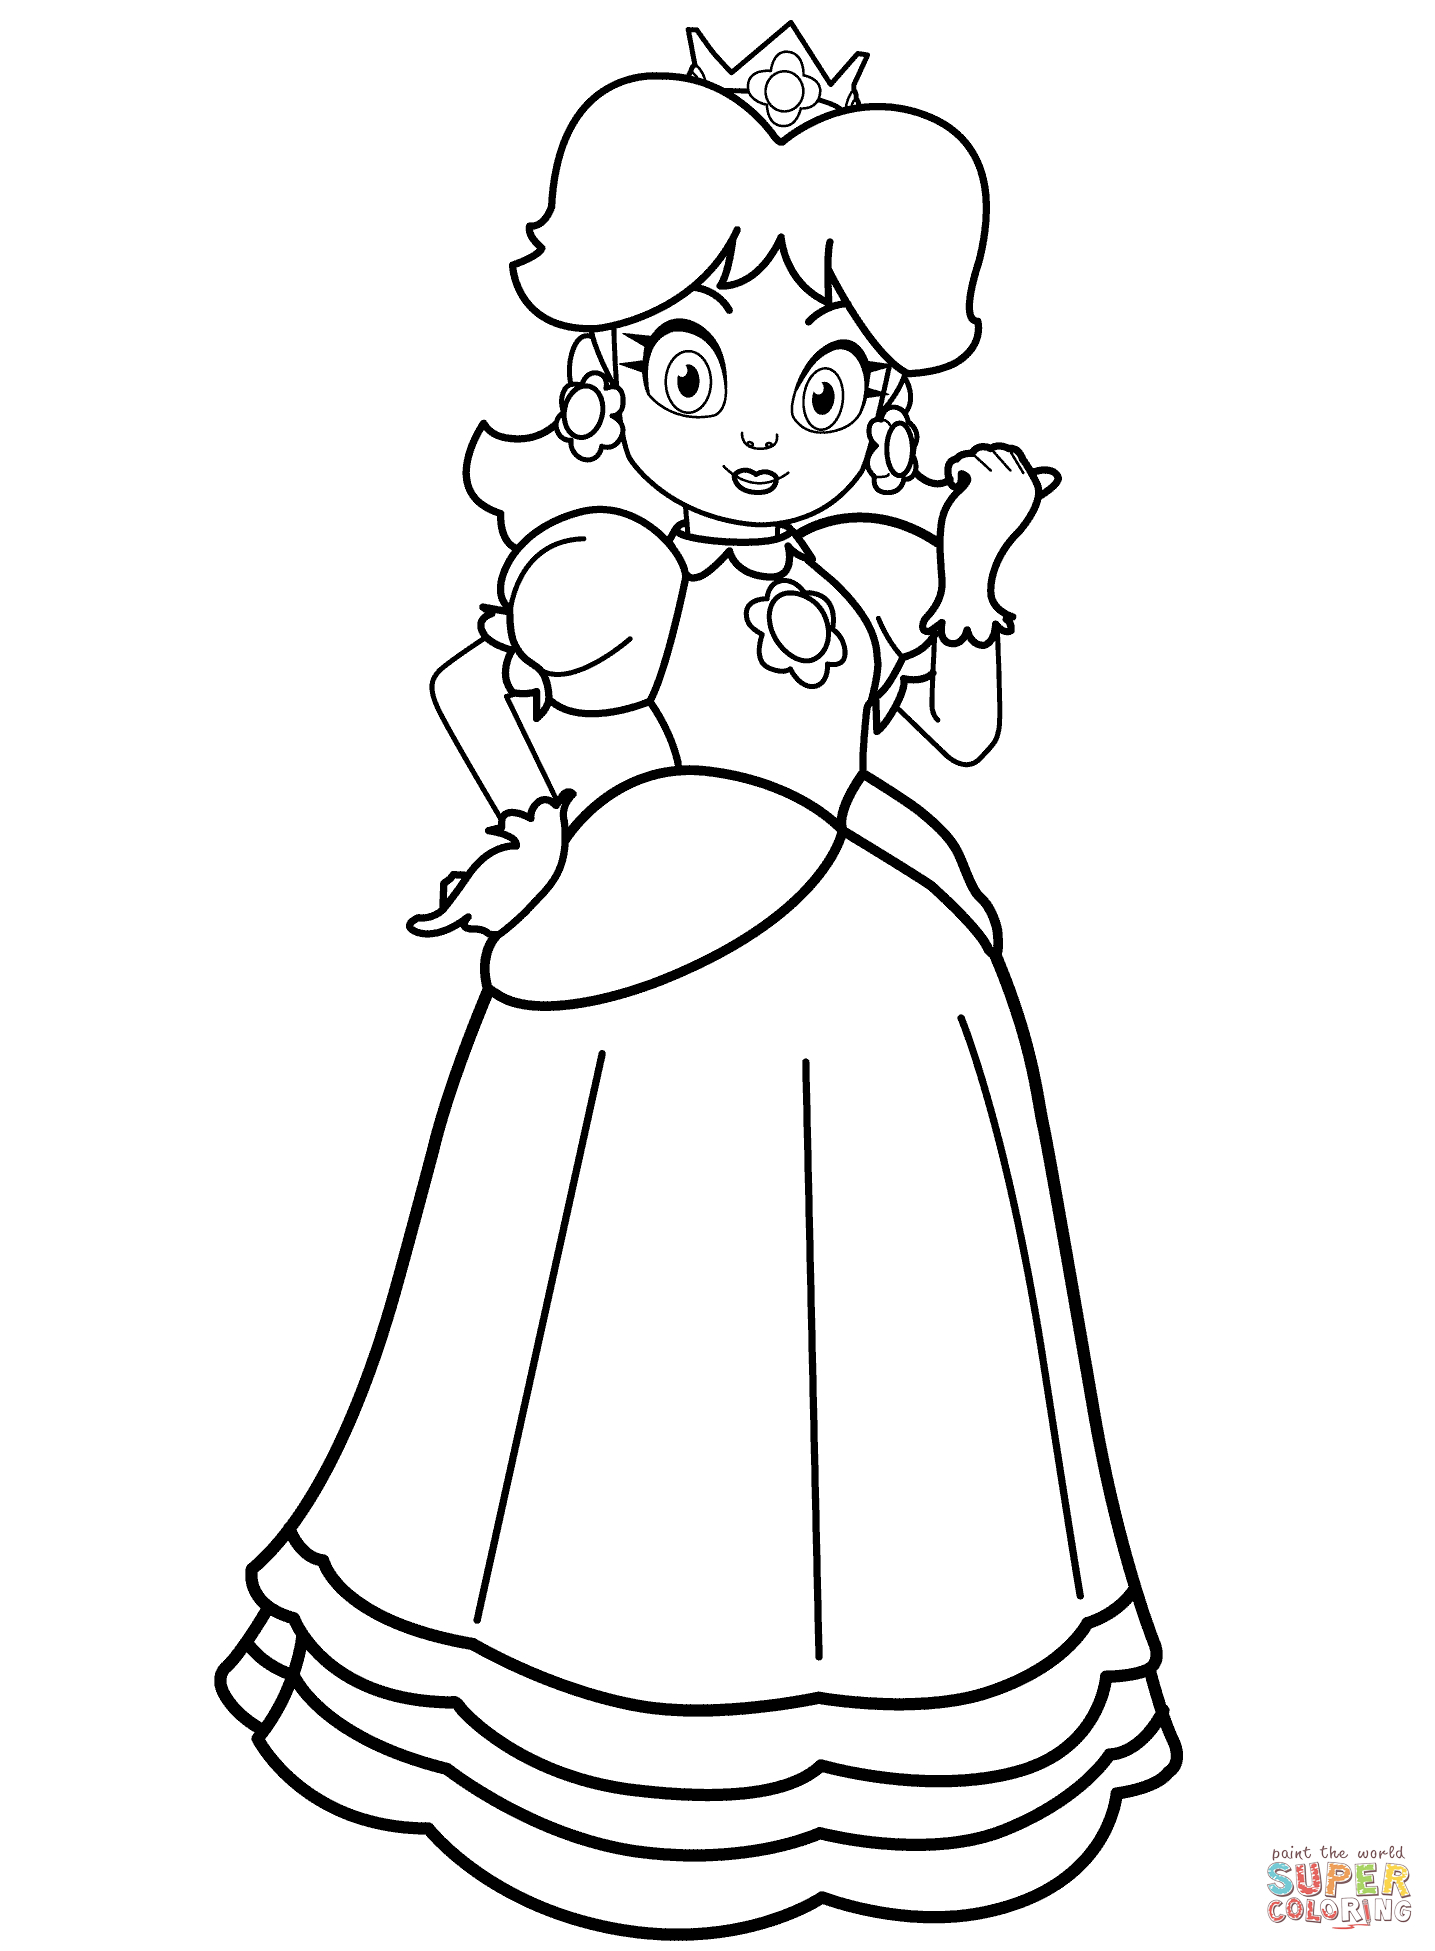 Free Princess Daisy Coloring Page, Download Free Clip Art concernant Sudoku Junior À Imprimer